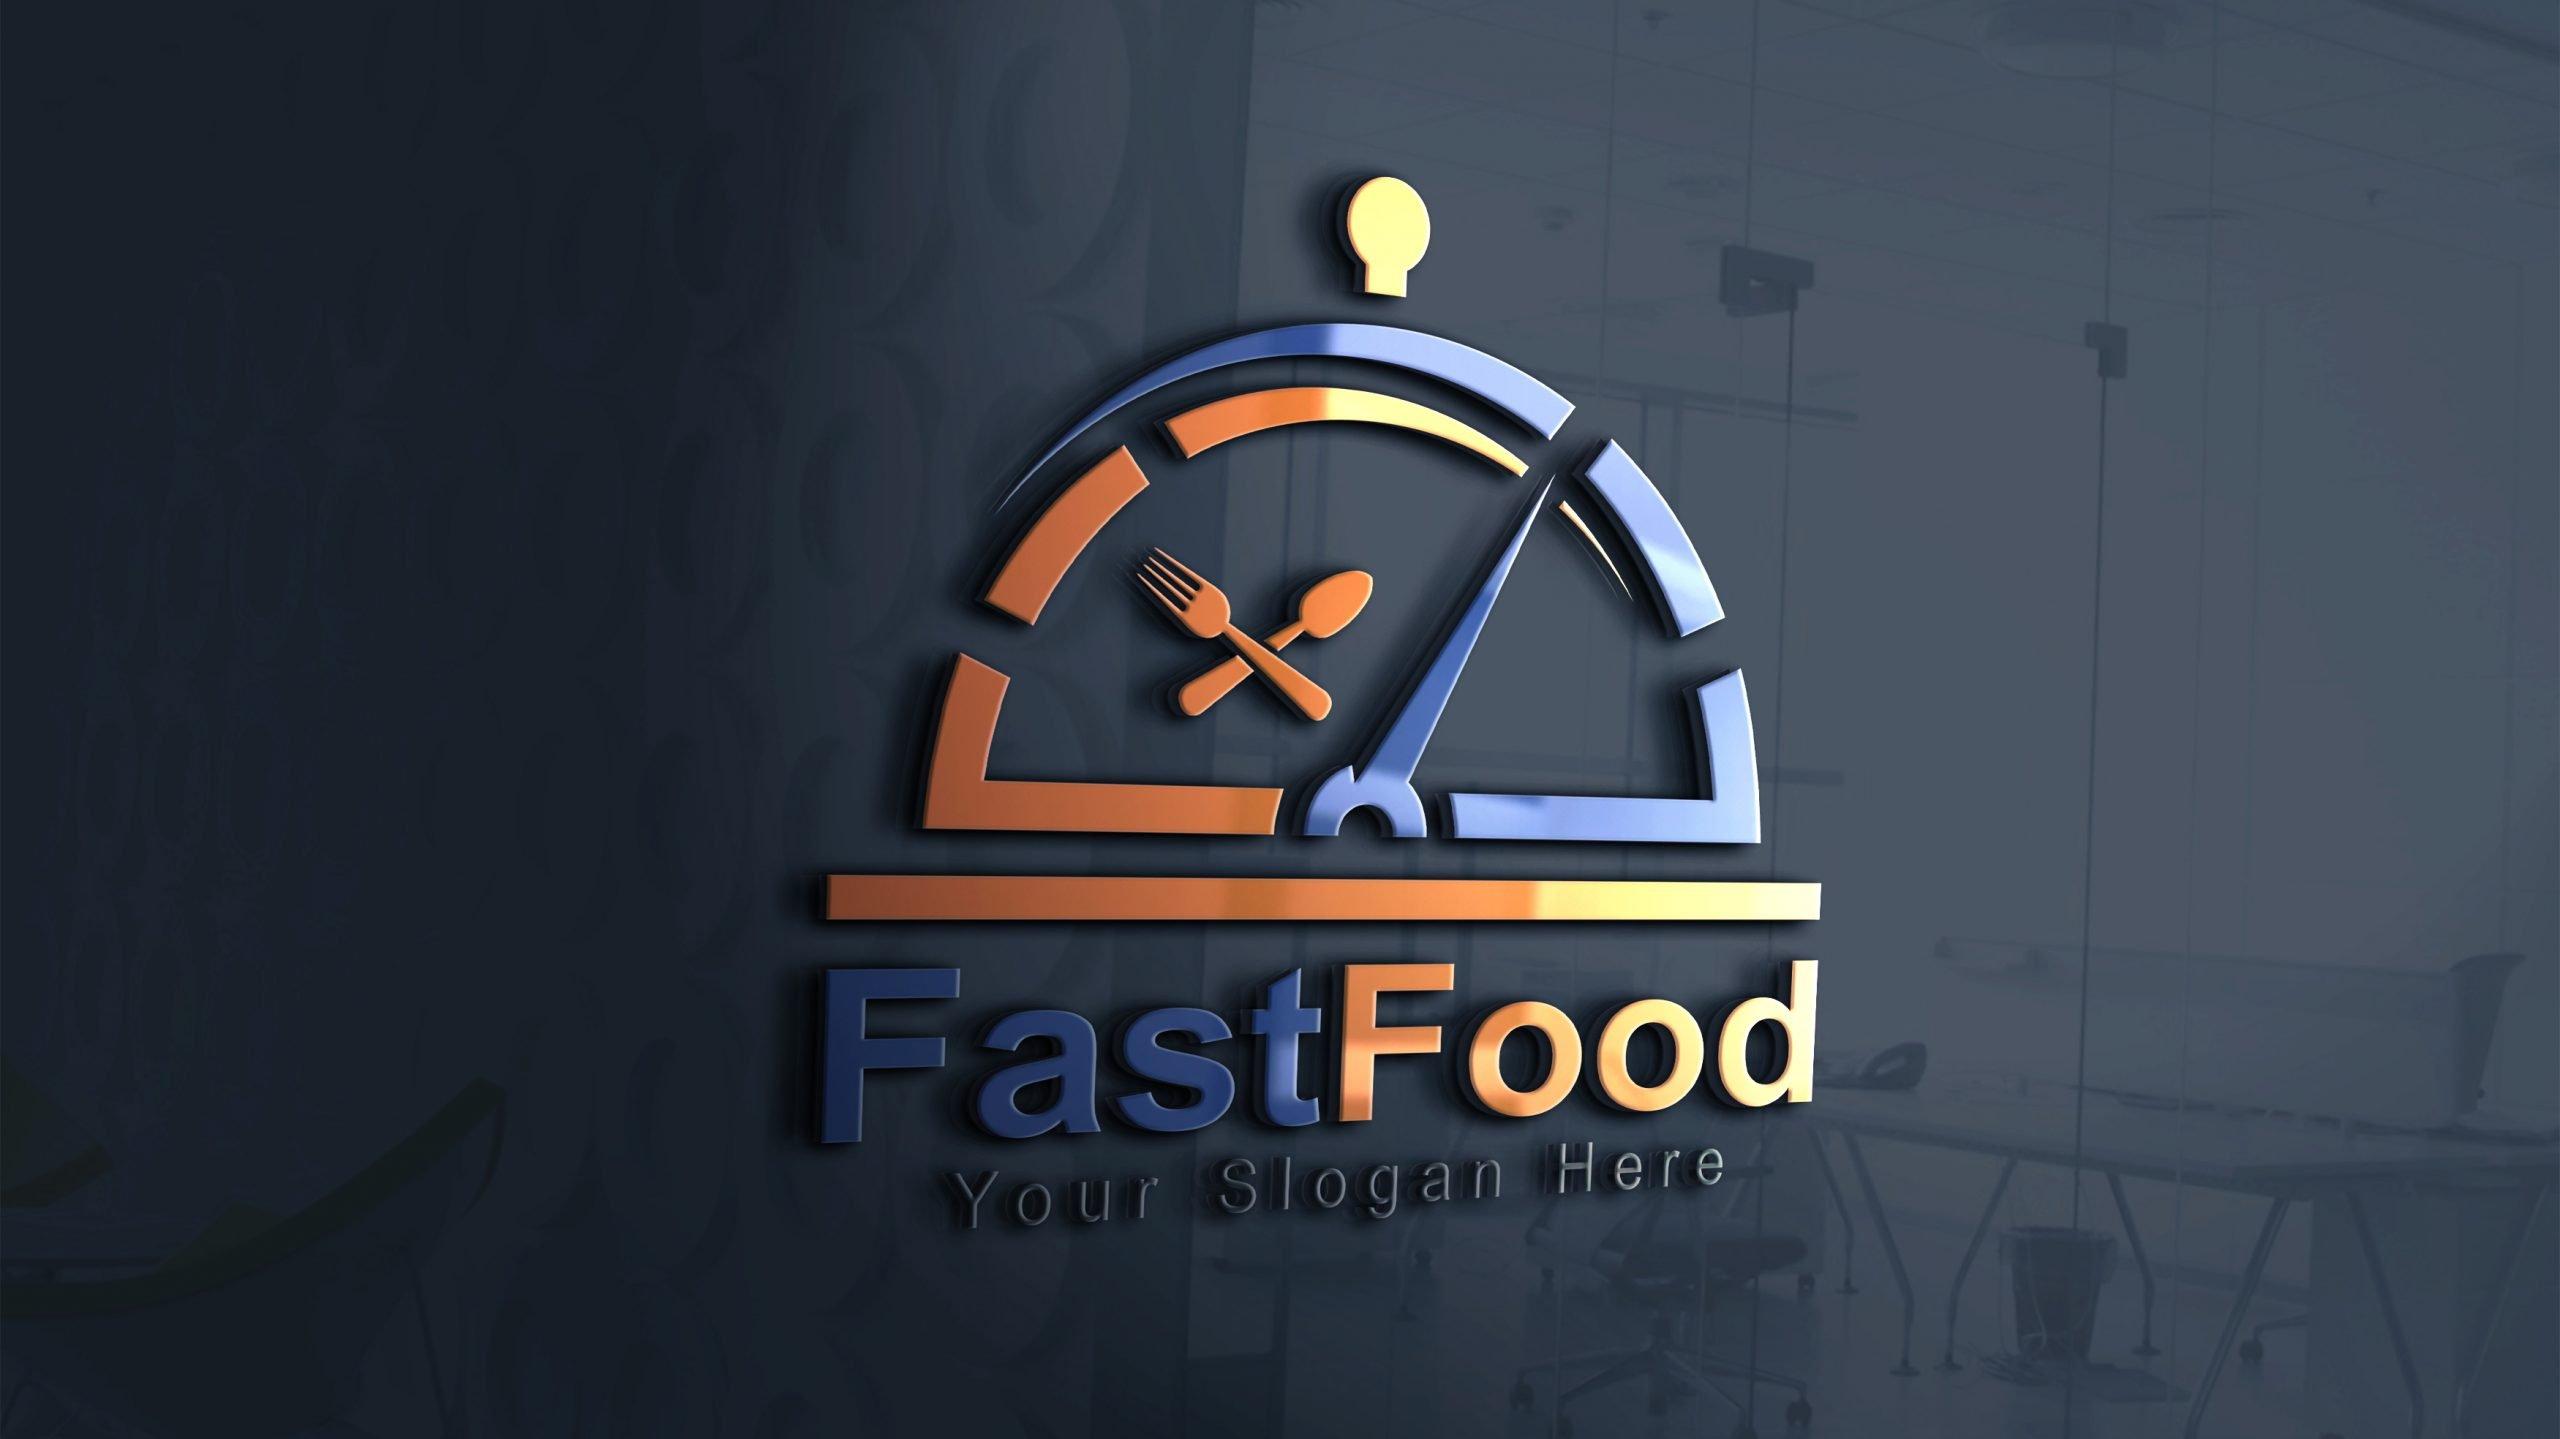 Fast food logo design photoshop file